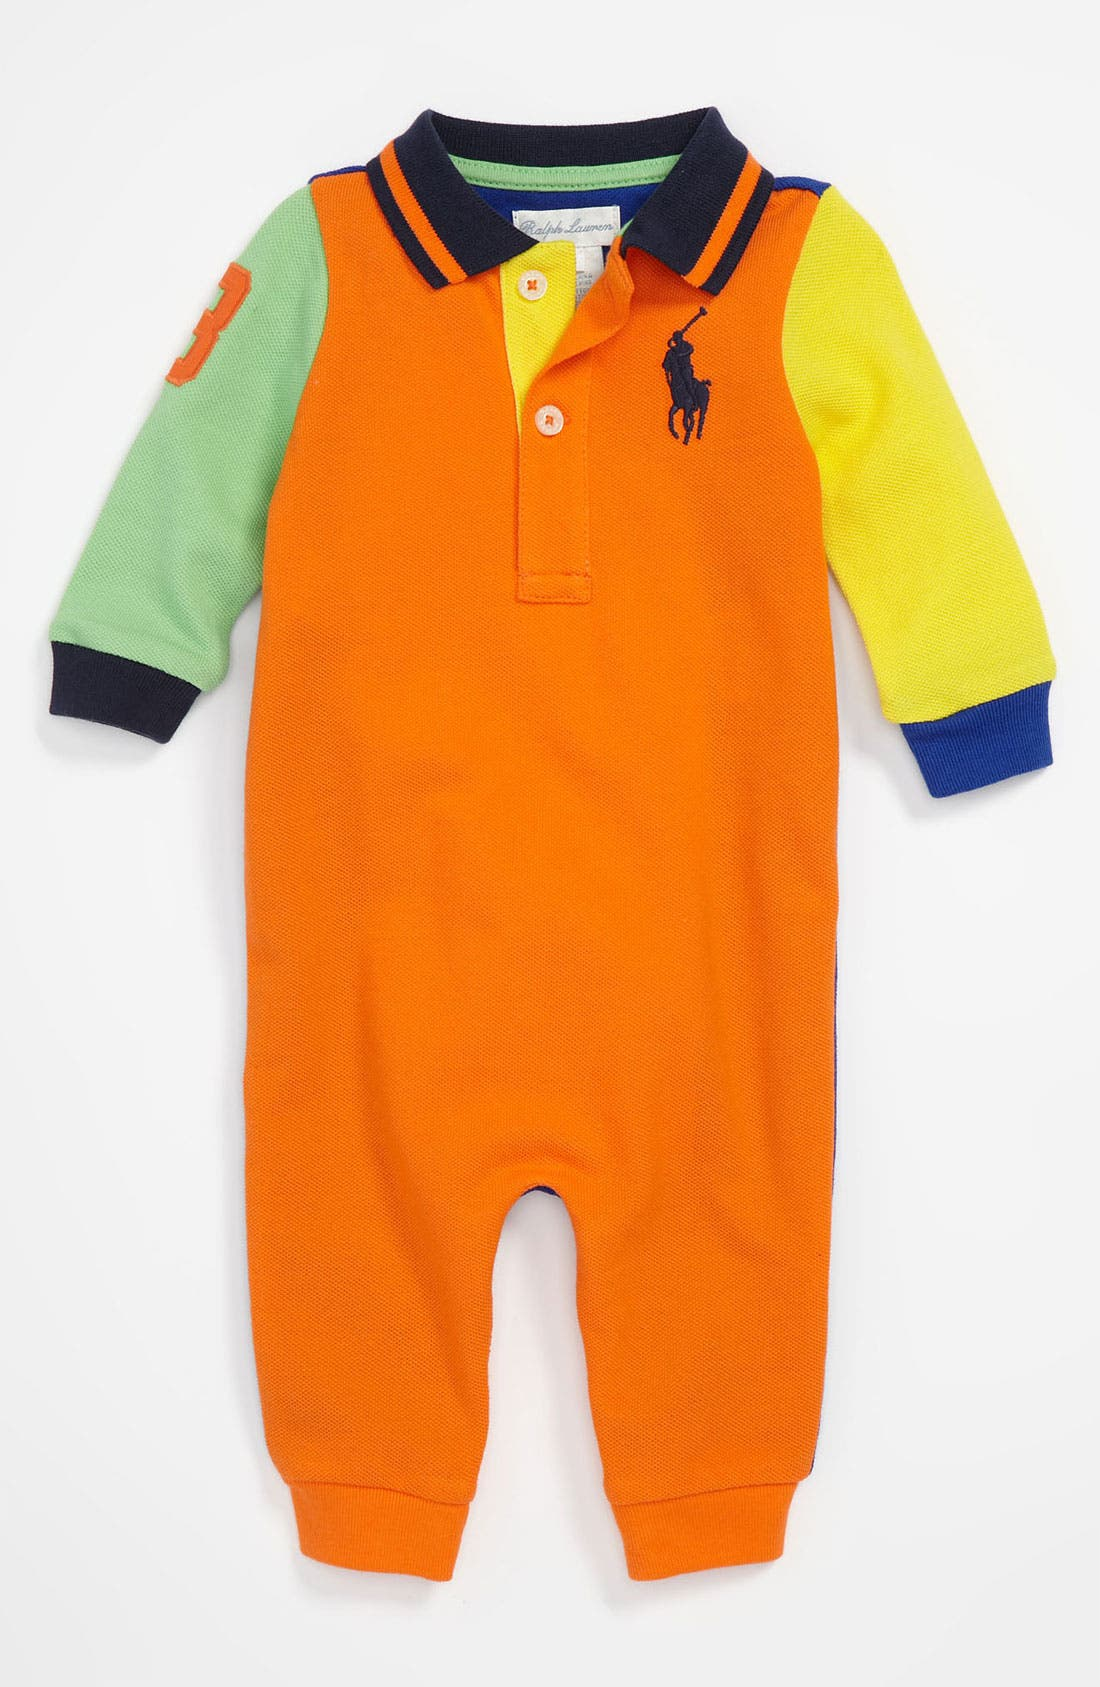 Alternate Image 1 Selected - Ralph Lauren Colorblock Romper (Infant)